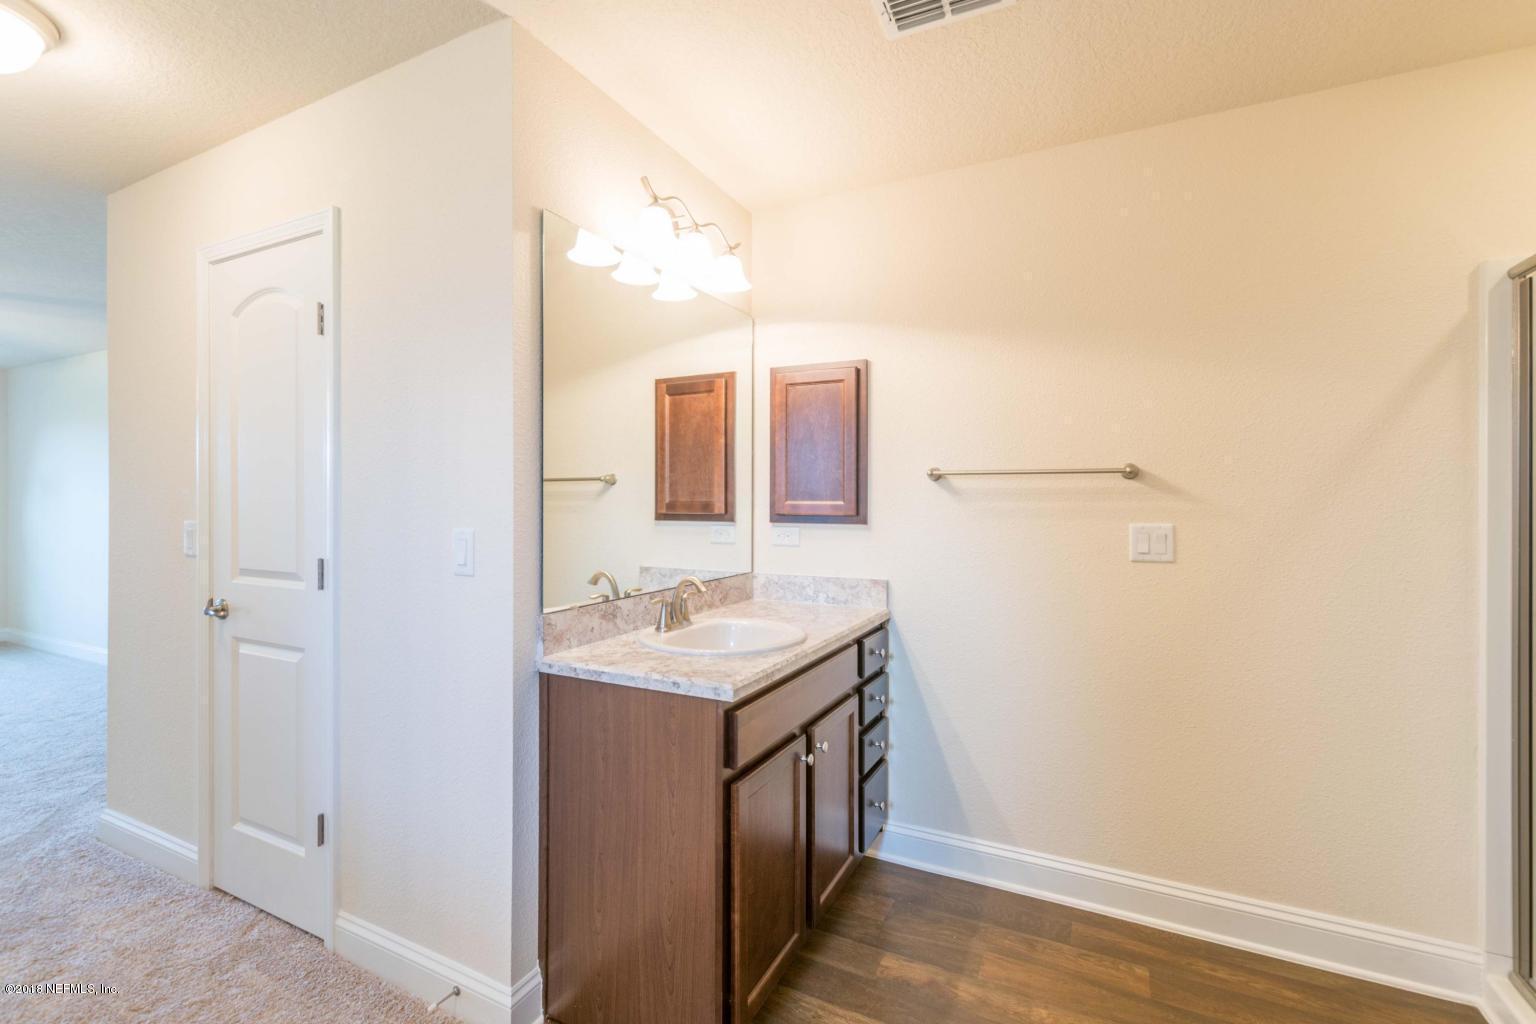 12510 DEWHURST, JACKSONVILLE, FLORIDA 32218, 3 Bedrooms Bedrooms, ,2 BathroomsBathrooms,Residential - single family,For sale,DEWHURST,947653